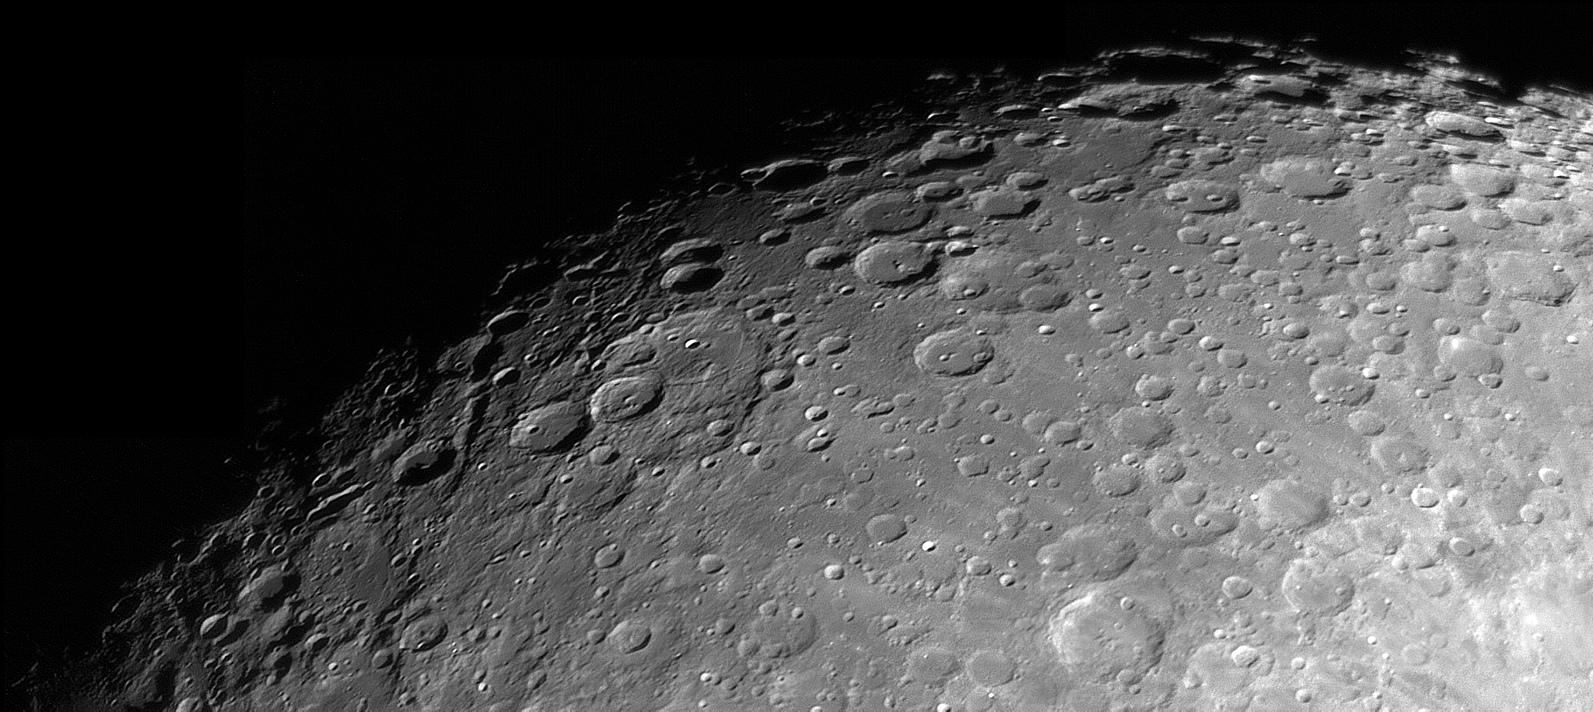 lune2.jpg.b280aea6ebfbf69ab9eab9de1207dfc2.jpg